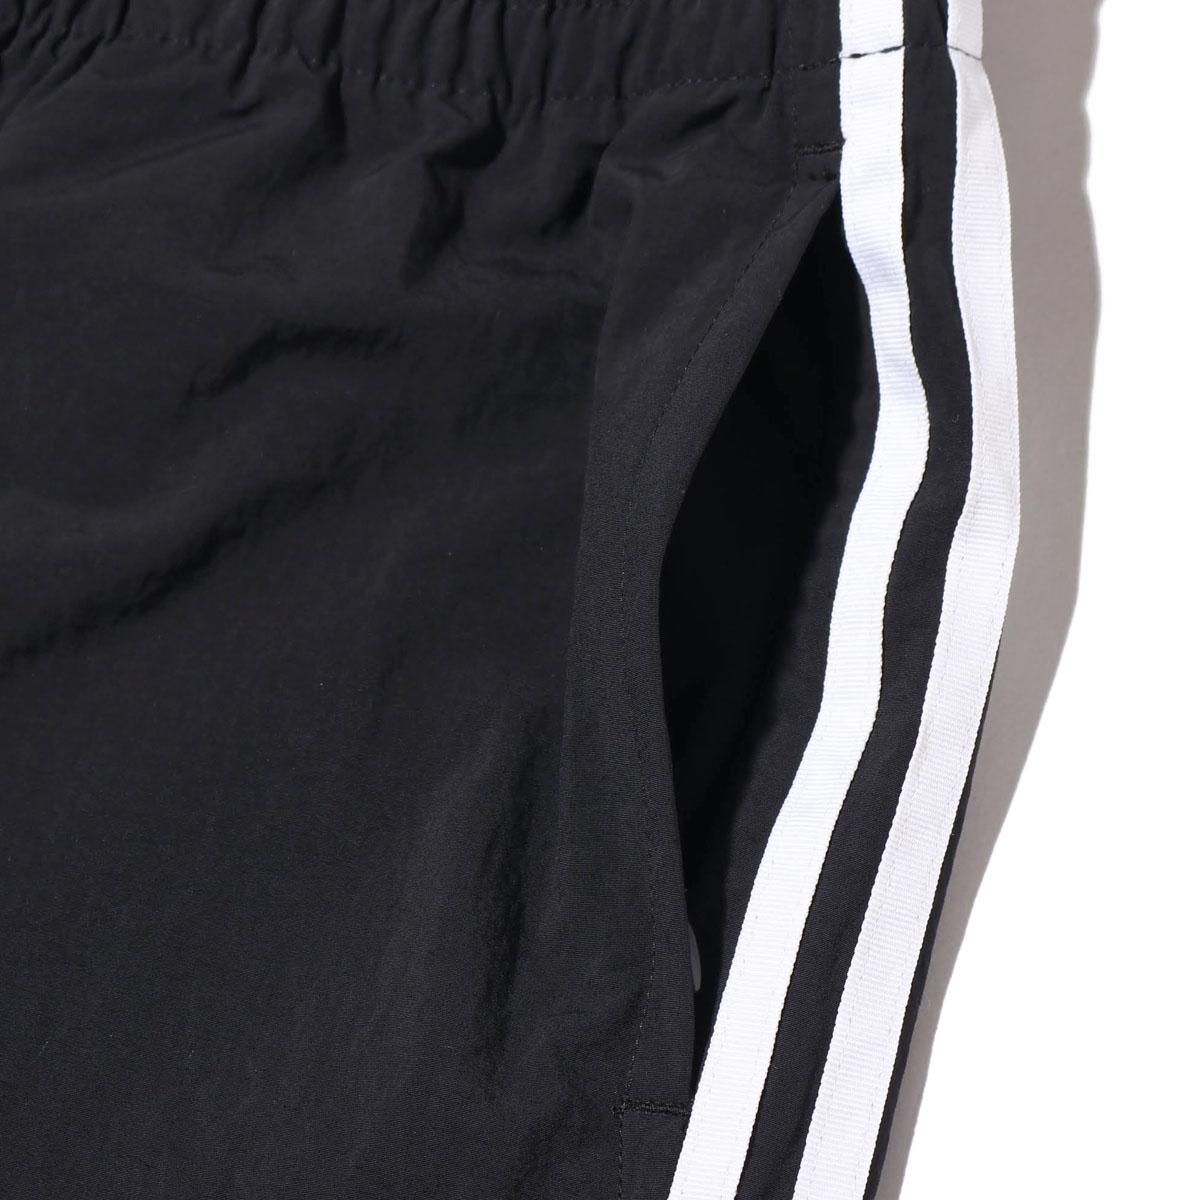 finest selection 7d49c 23404 adidas Originals NMD TRACK PANTS (Adidas originals N M D trackpants) BLACK  18FW-I